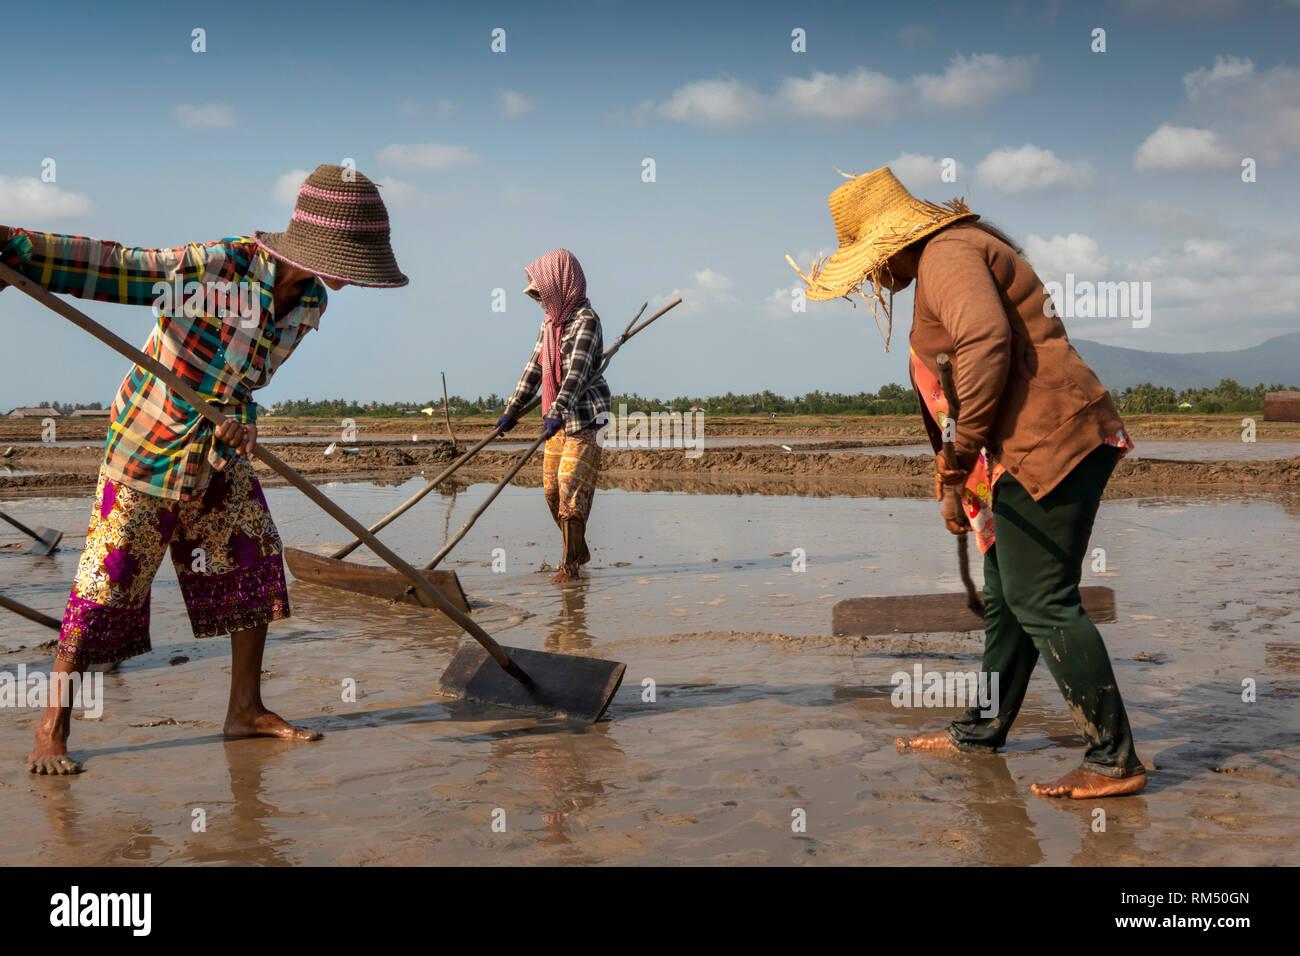 Cambodia, Kampot Province, Kampot, Tuek Chhou, Salt Fields, women preparing field for flooding with seawater Stock Photo